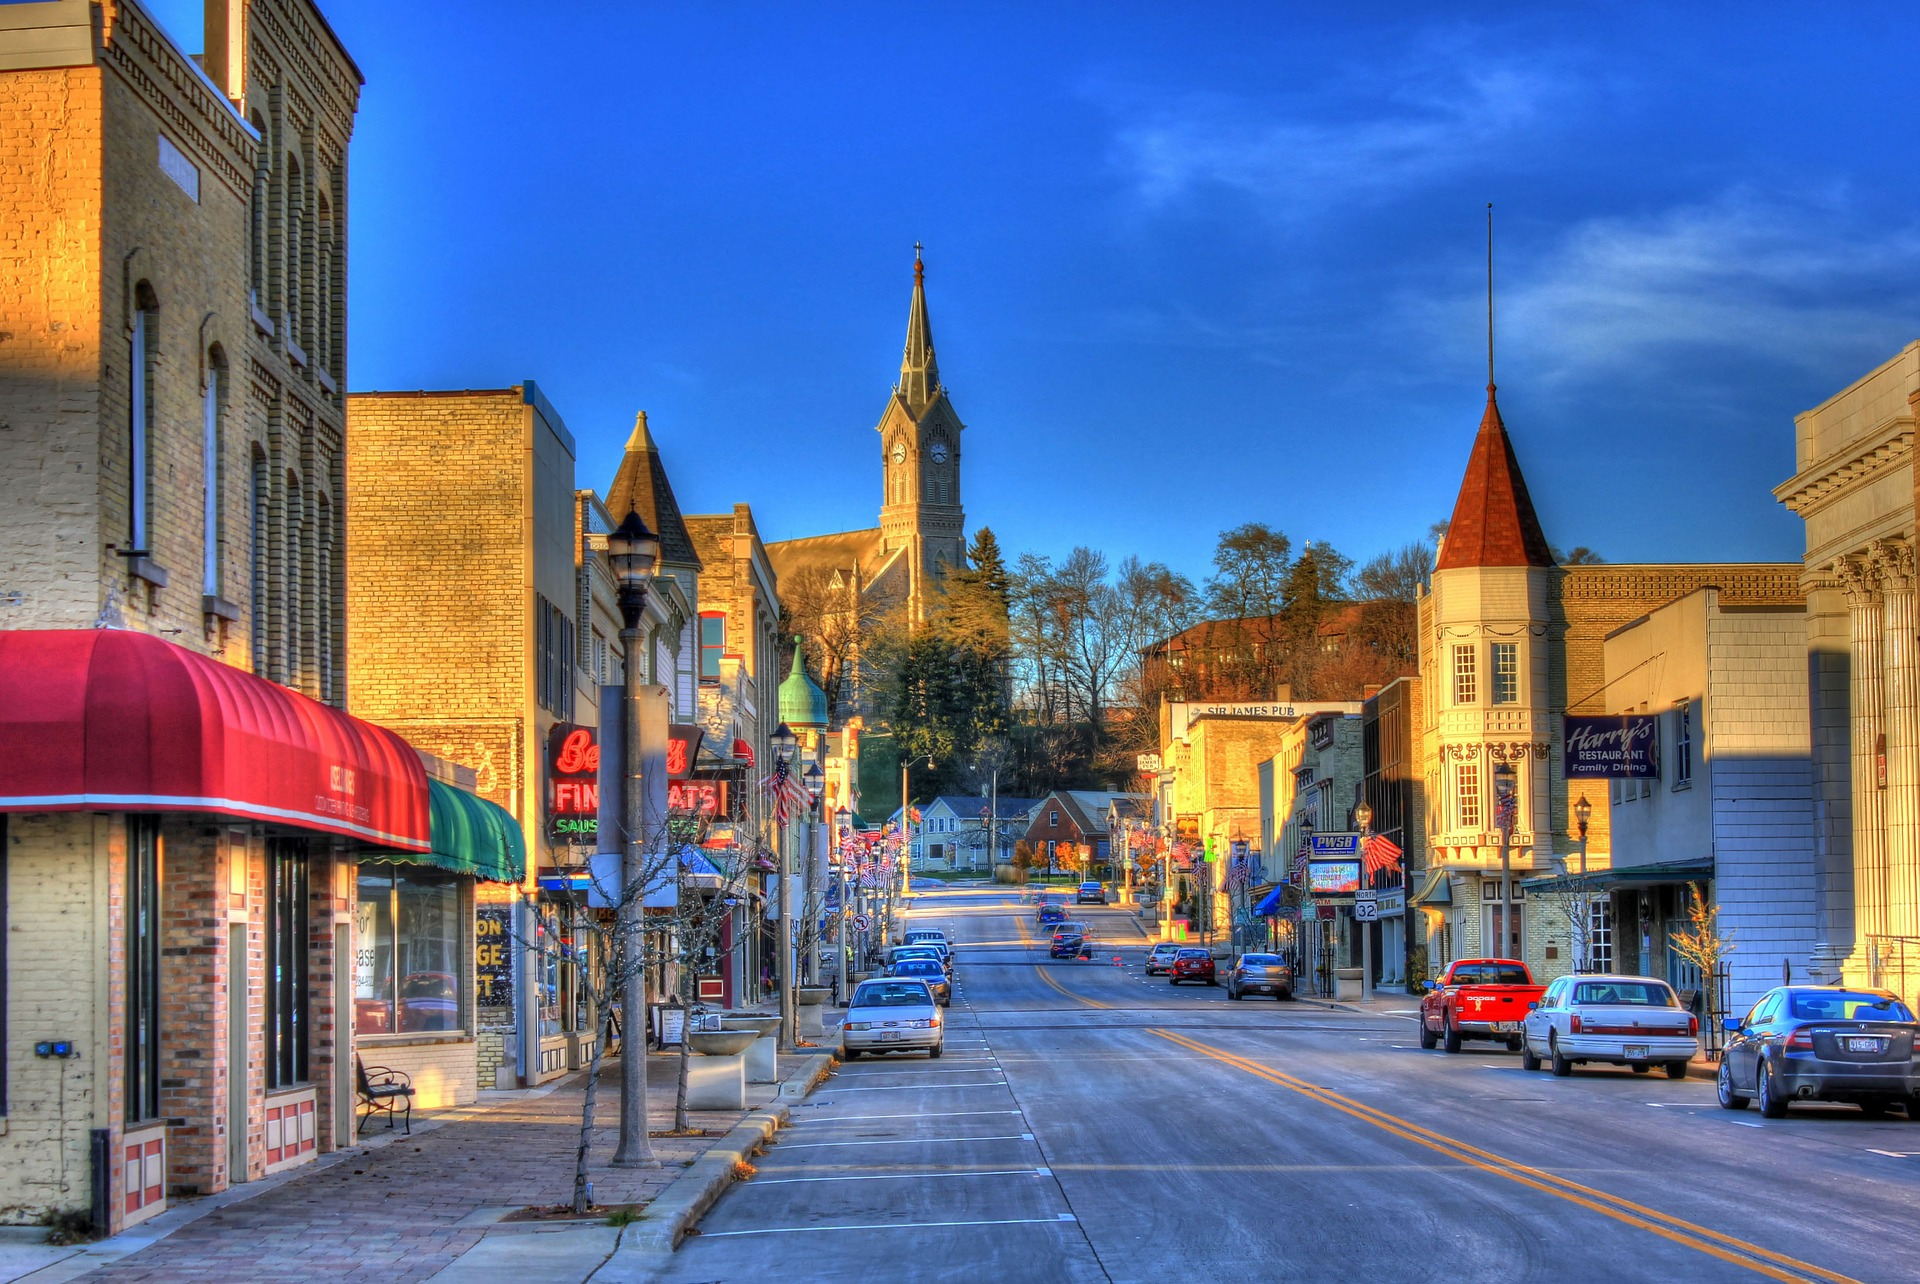 downtown-347454_1920.jpg